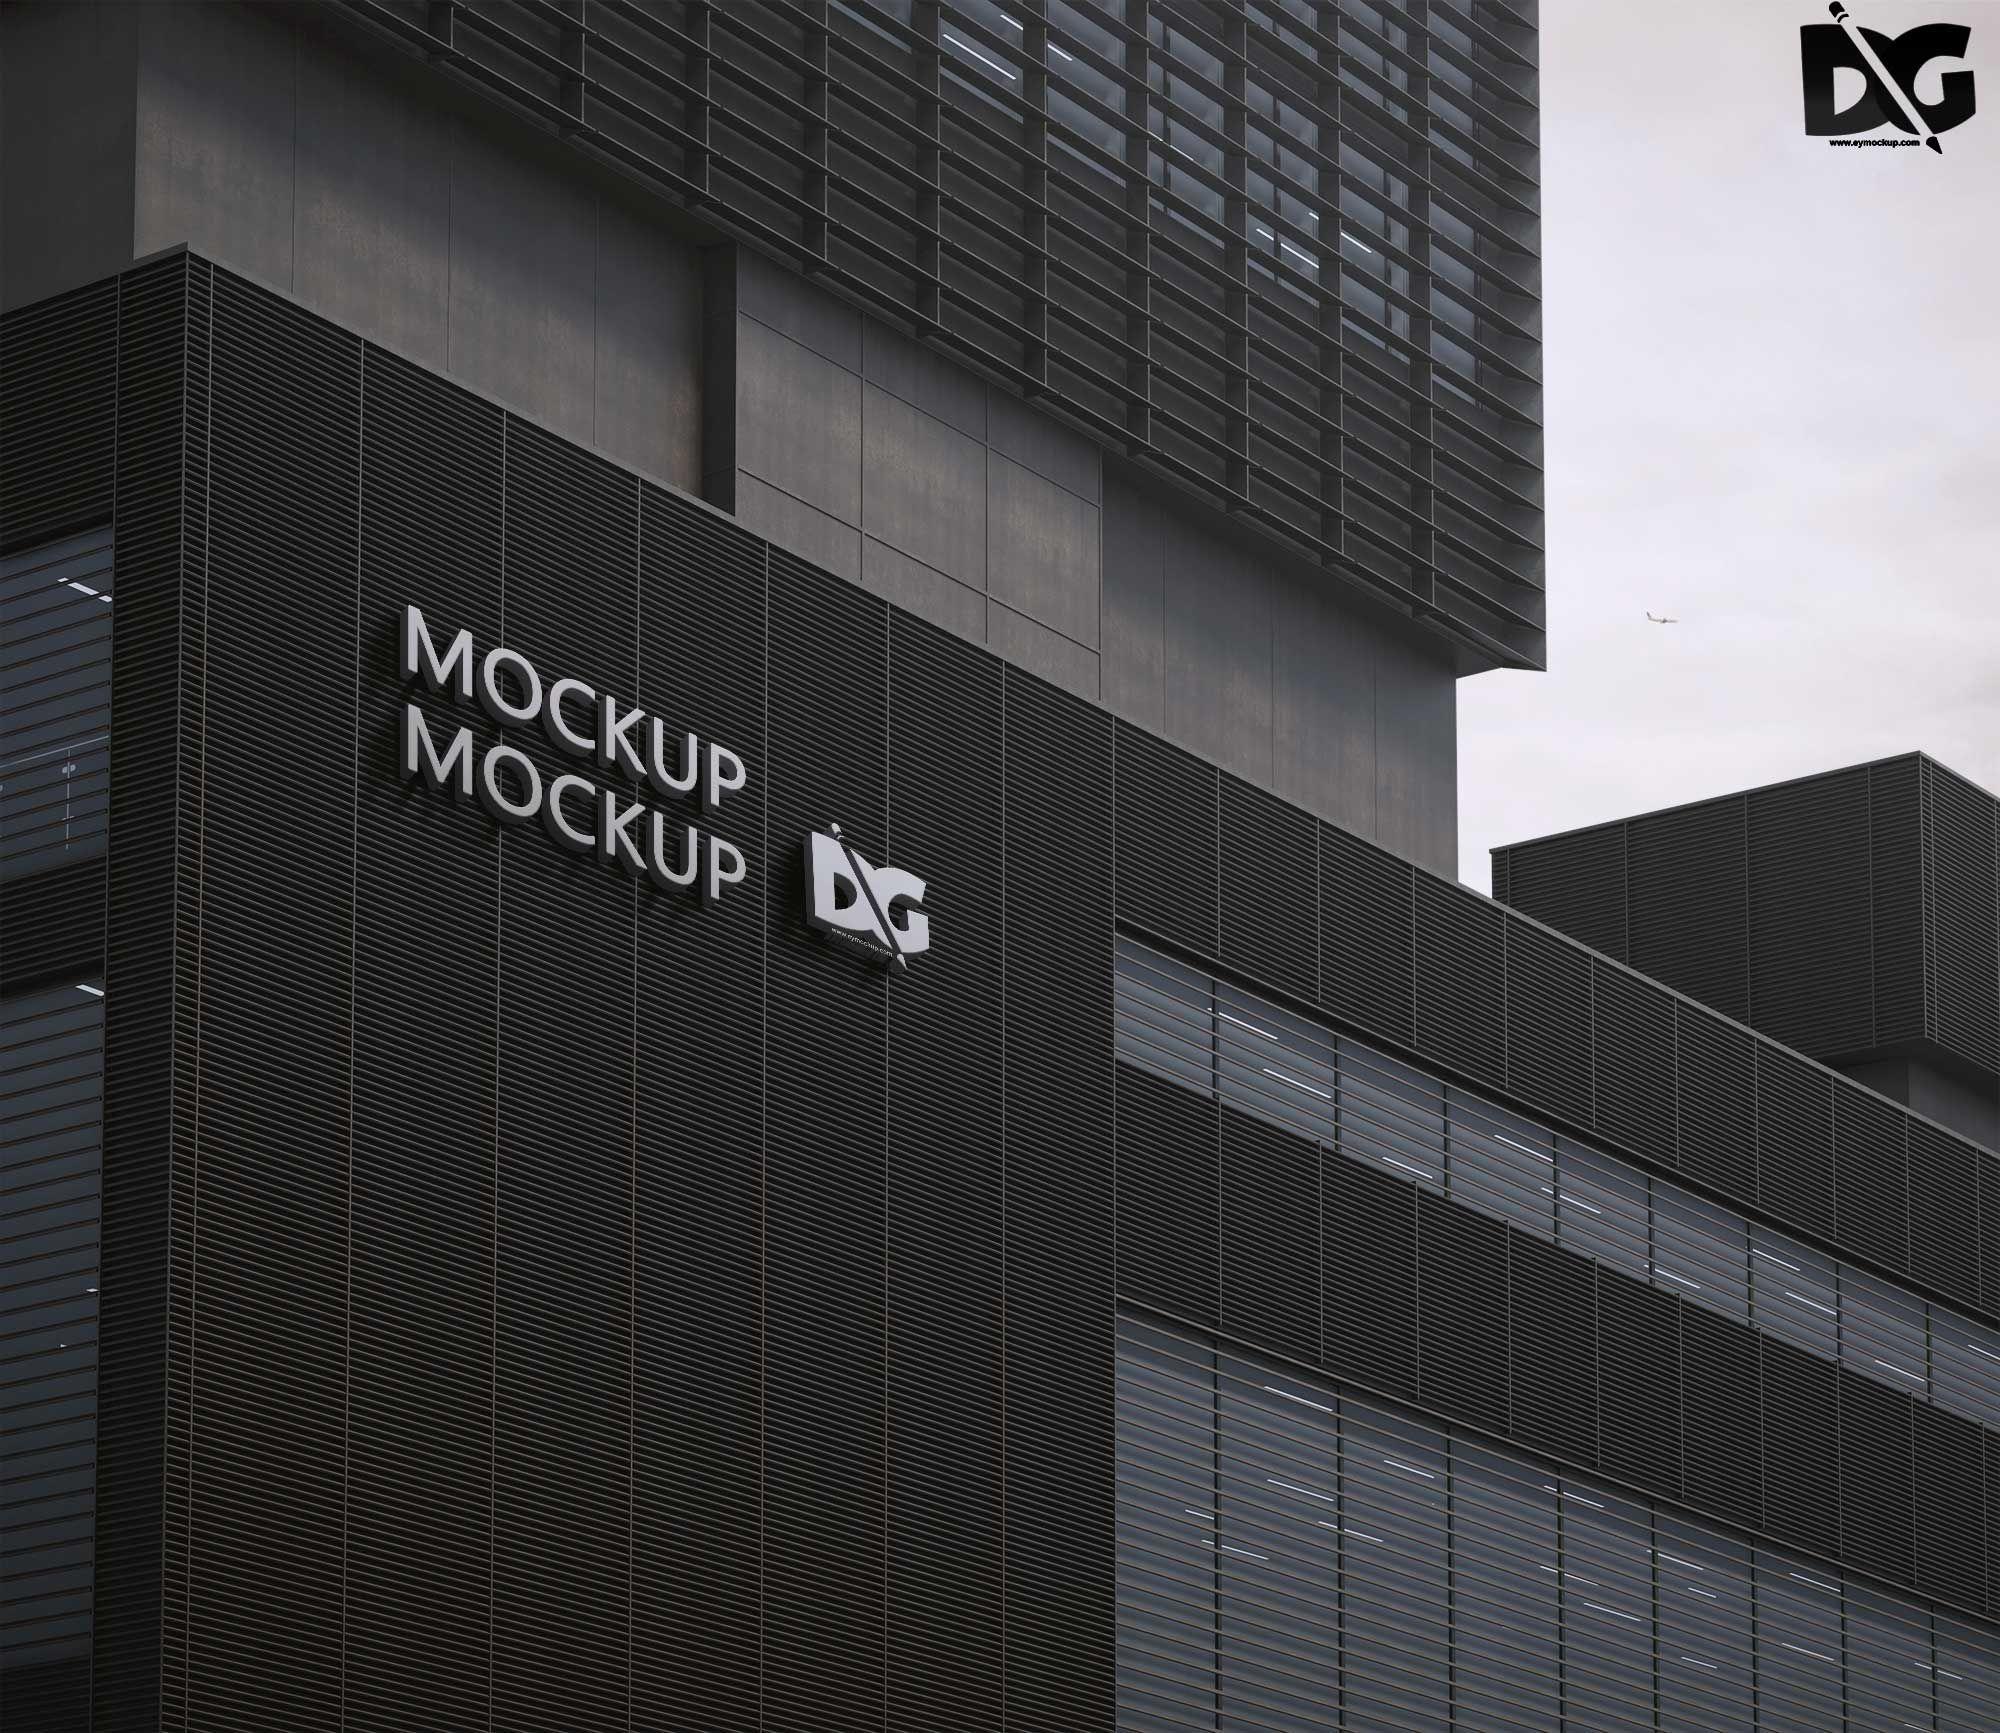 Free Premium Office Building Psd Logo Design Mockup Https Freepsdmock Up Com Free Premium Office Build Design Mockup Free Logo Design Mockup Mockup Free Psd